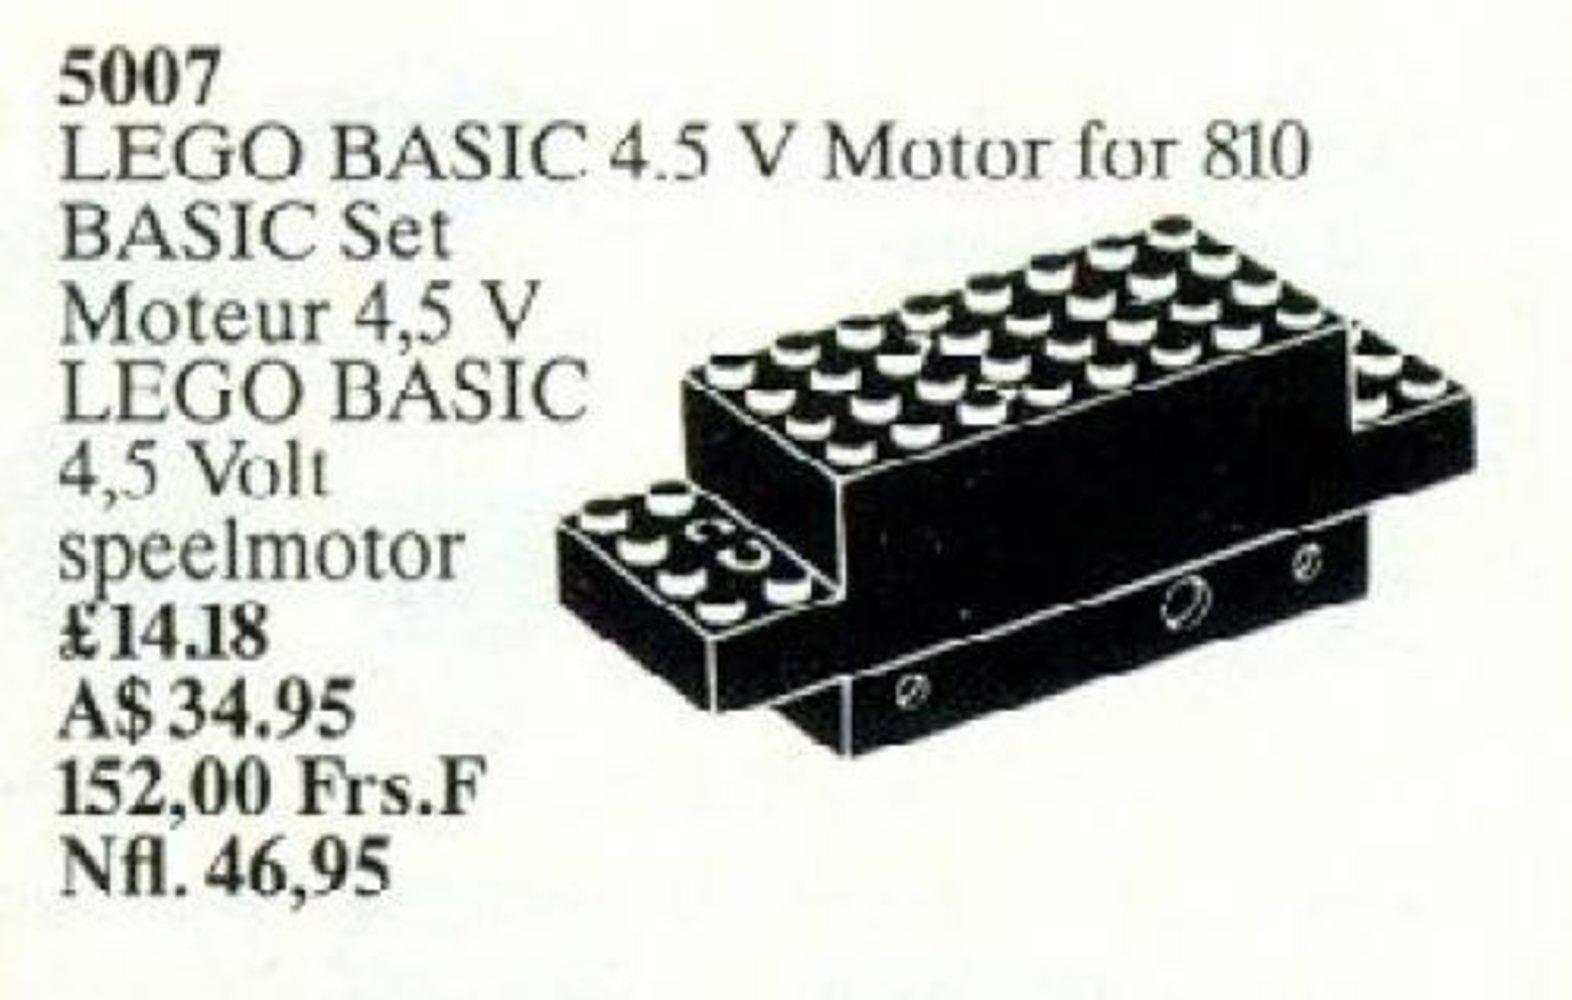 Basic Motor 4.5V